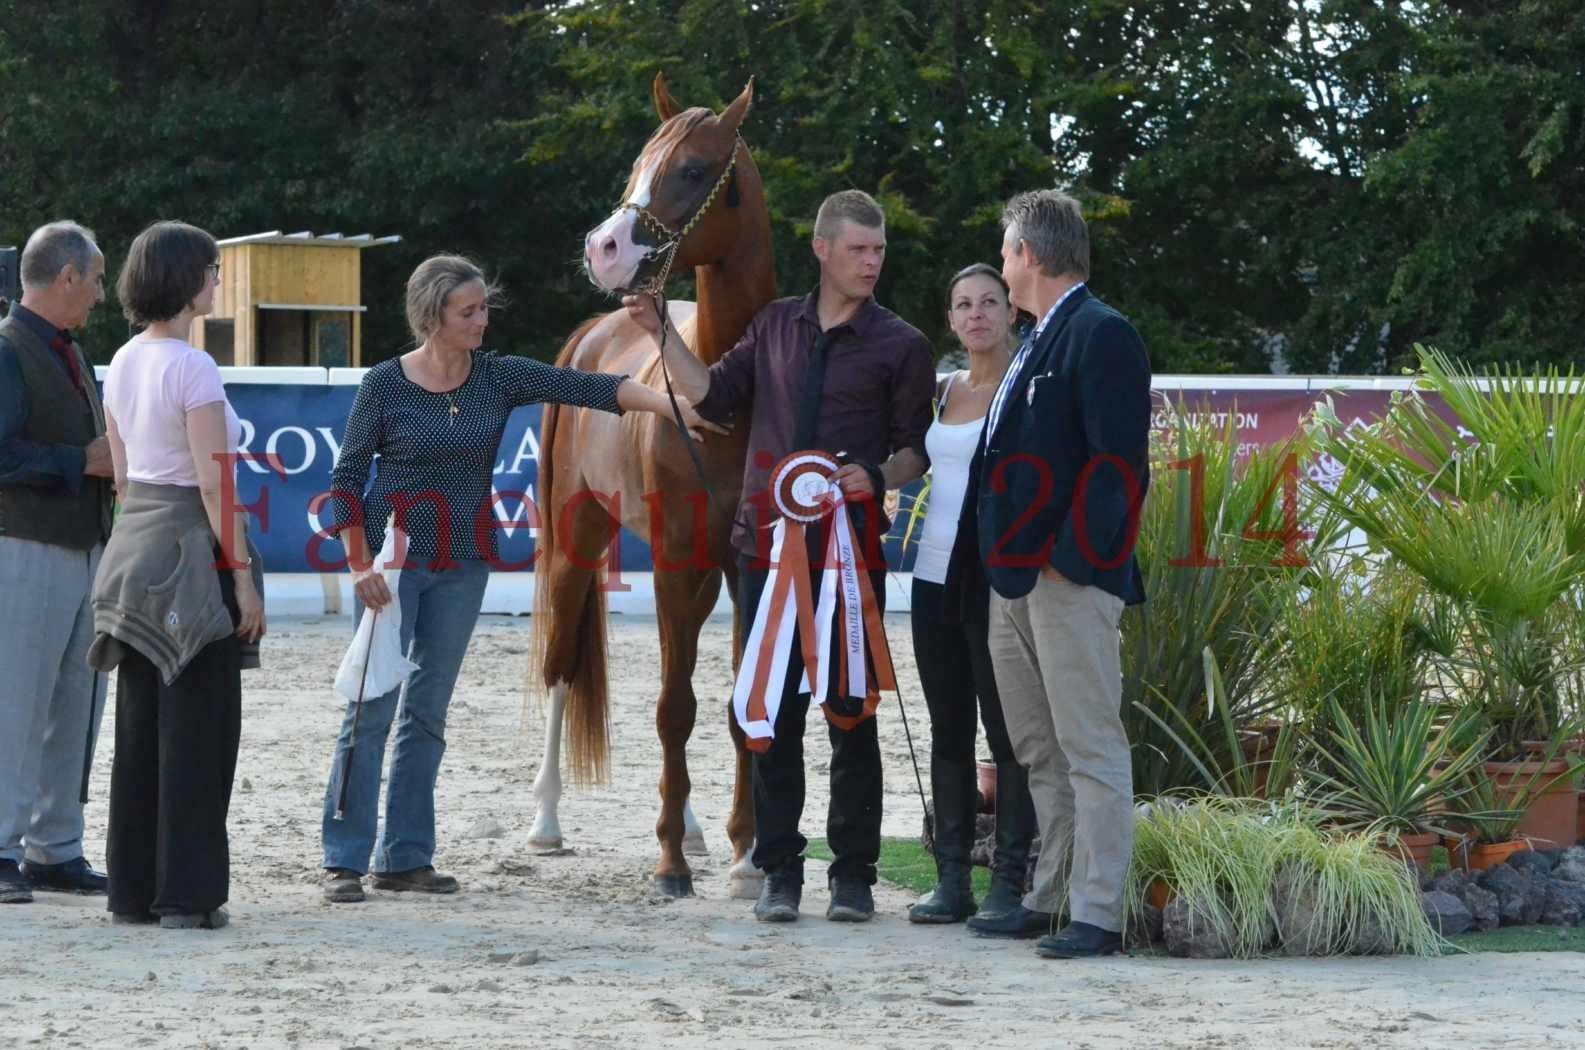 Championnat de FRANCE 2014 - Amateurs - SELECTO IBN SAMAWI - 100